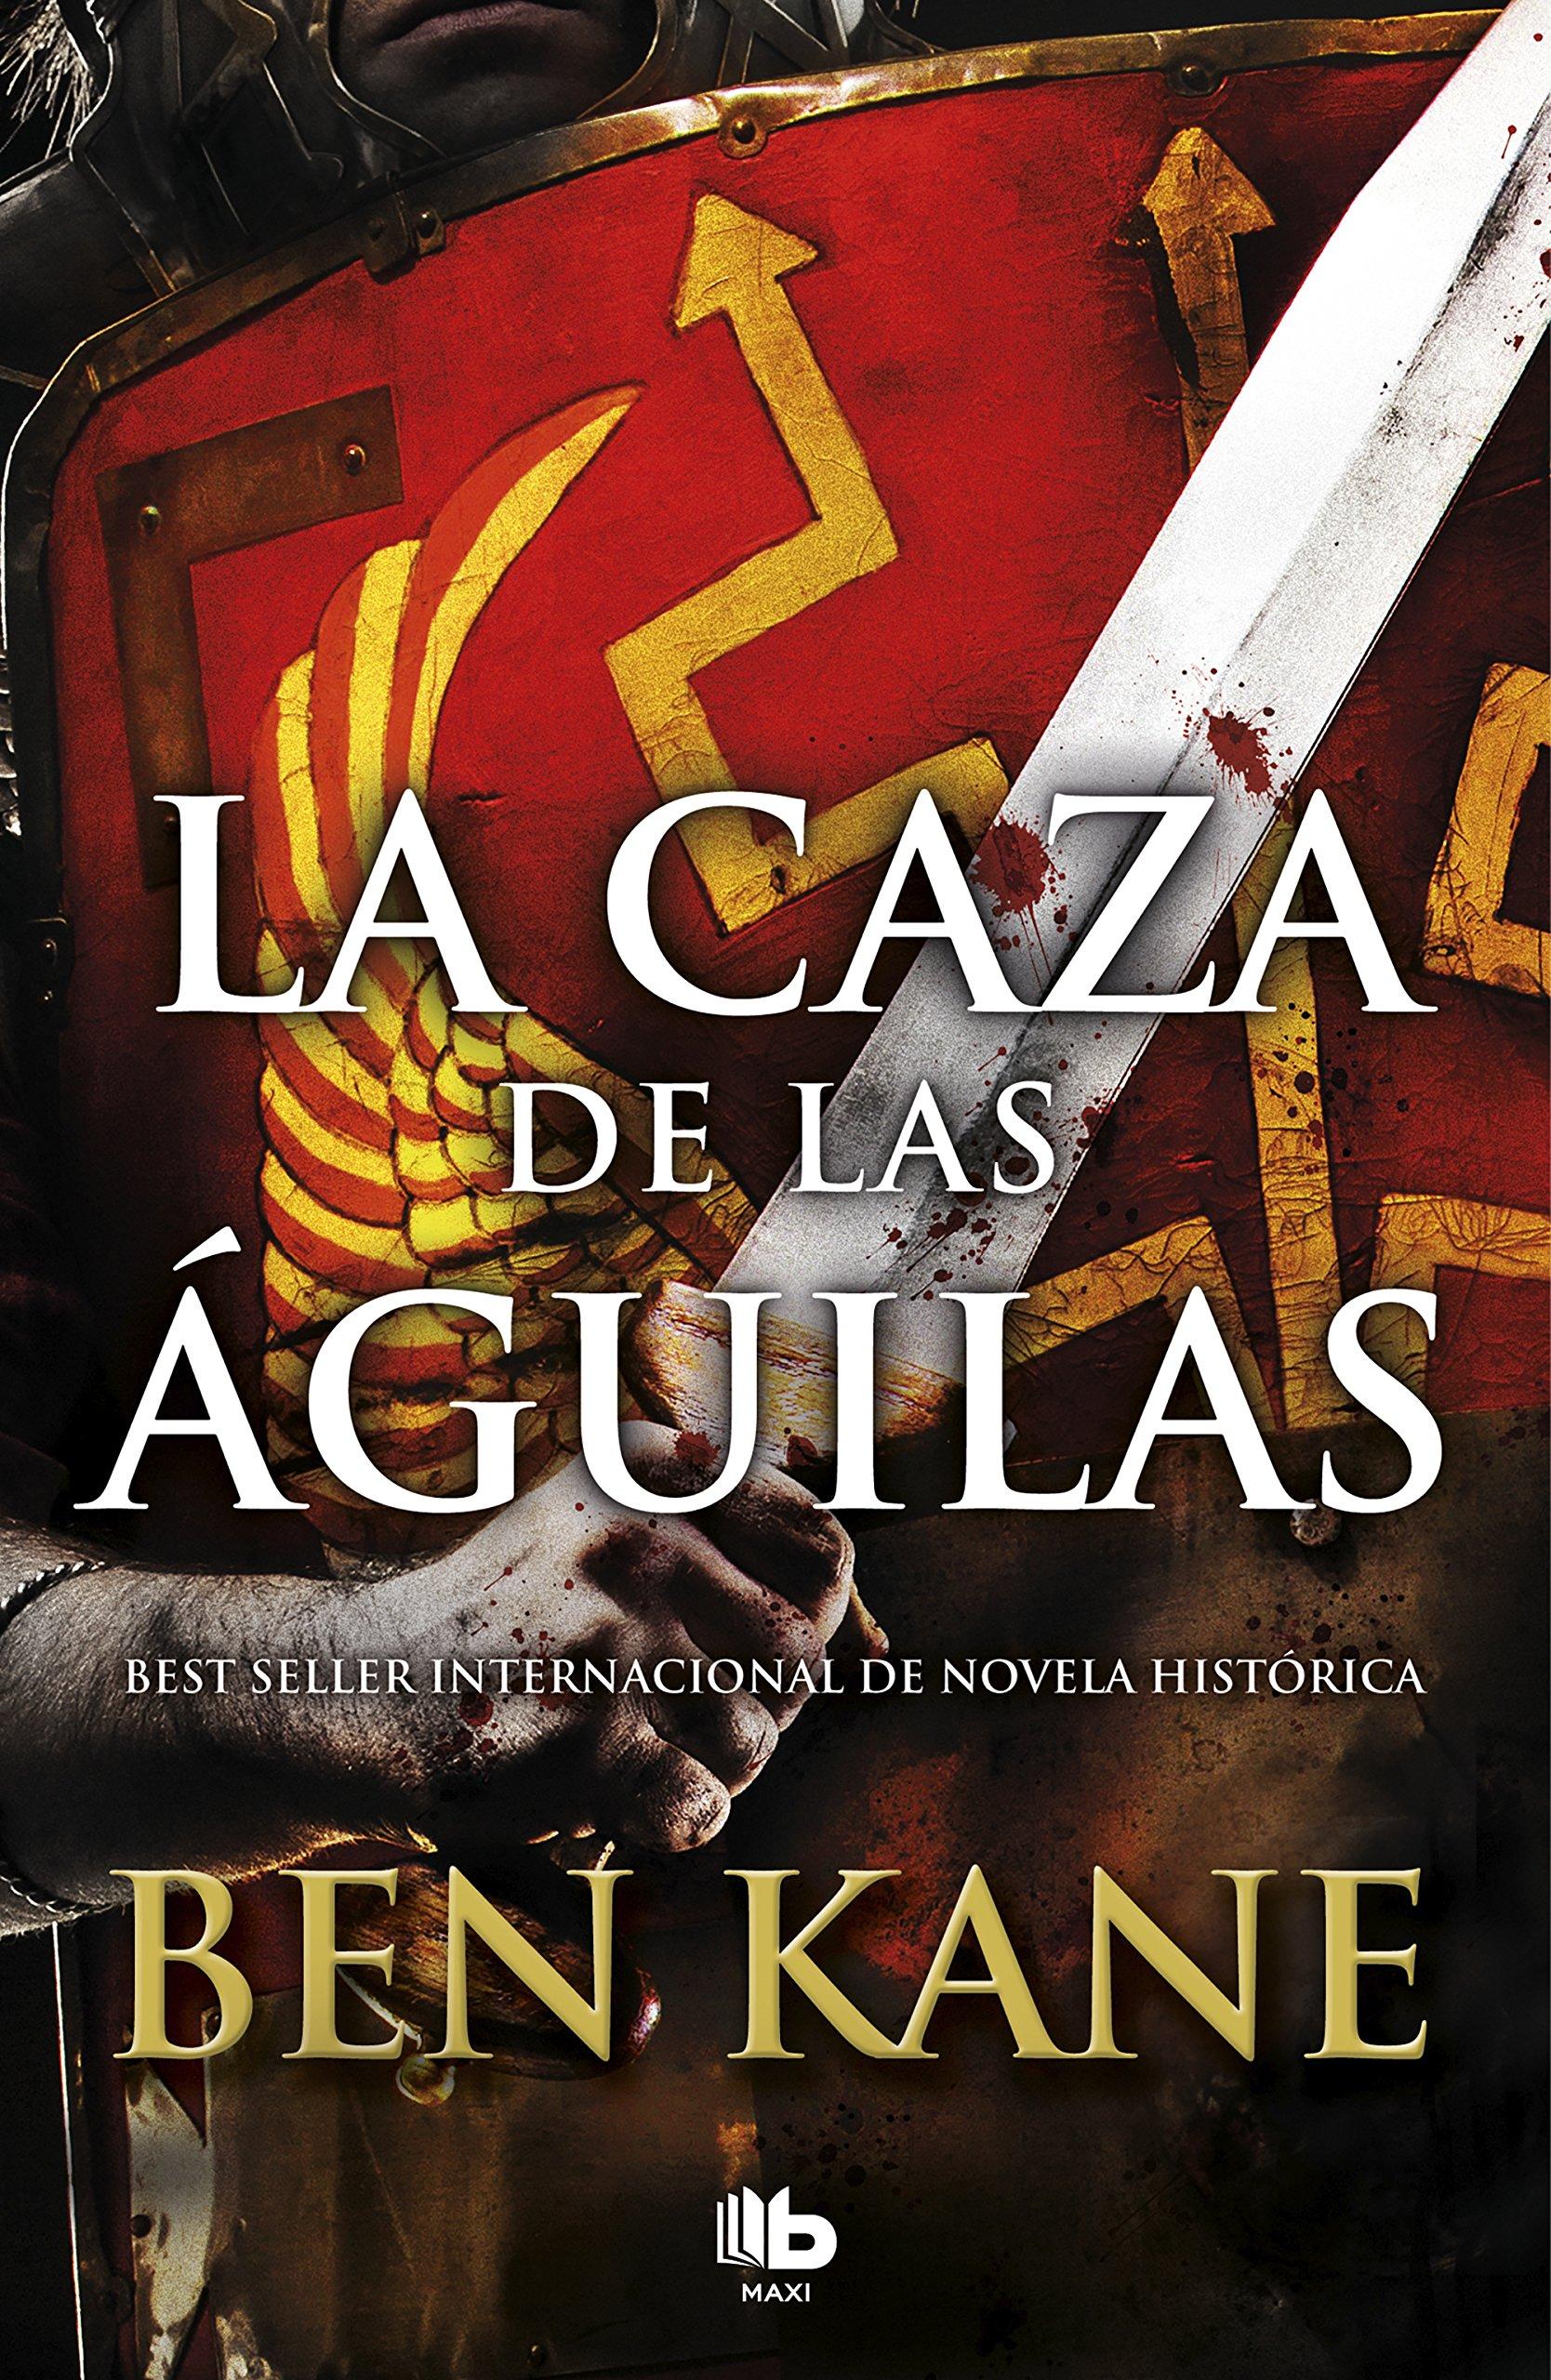 La caza de las águilas (Águilas de Roma 2) (MAXI) Tapa blanda – 18 oct 2018 Ben Kane B de Bolsillo (Ediciones B) 8490706867 FICTION / War & Military